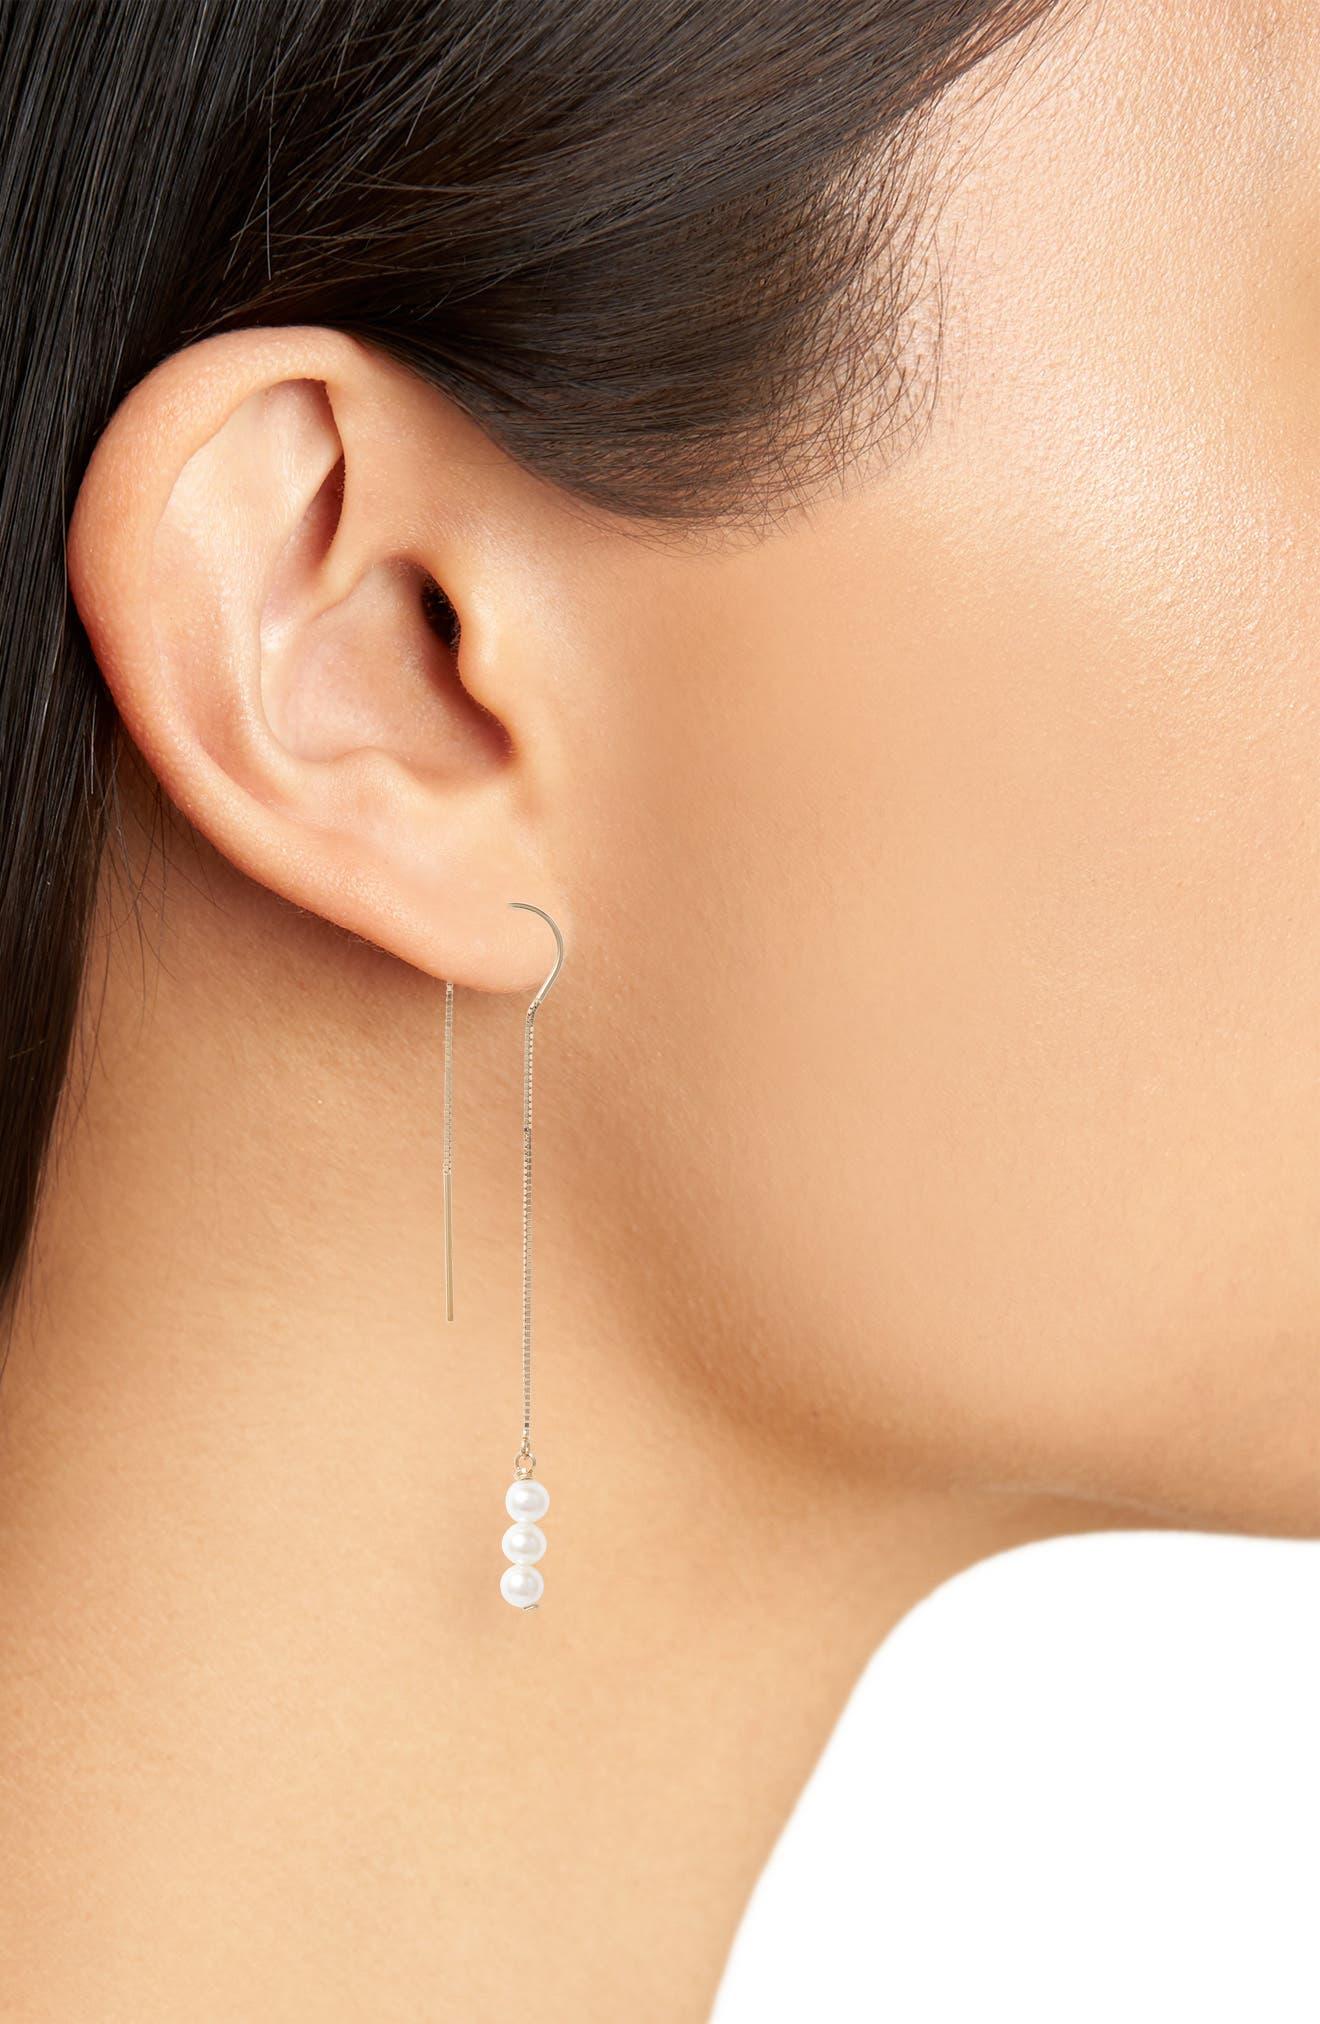 Triple Baby Pearl Threader Earrings,                             Alternate thumbnail 2, color,                             710